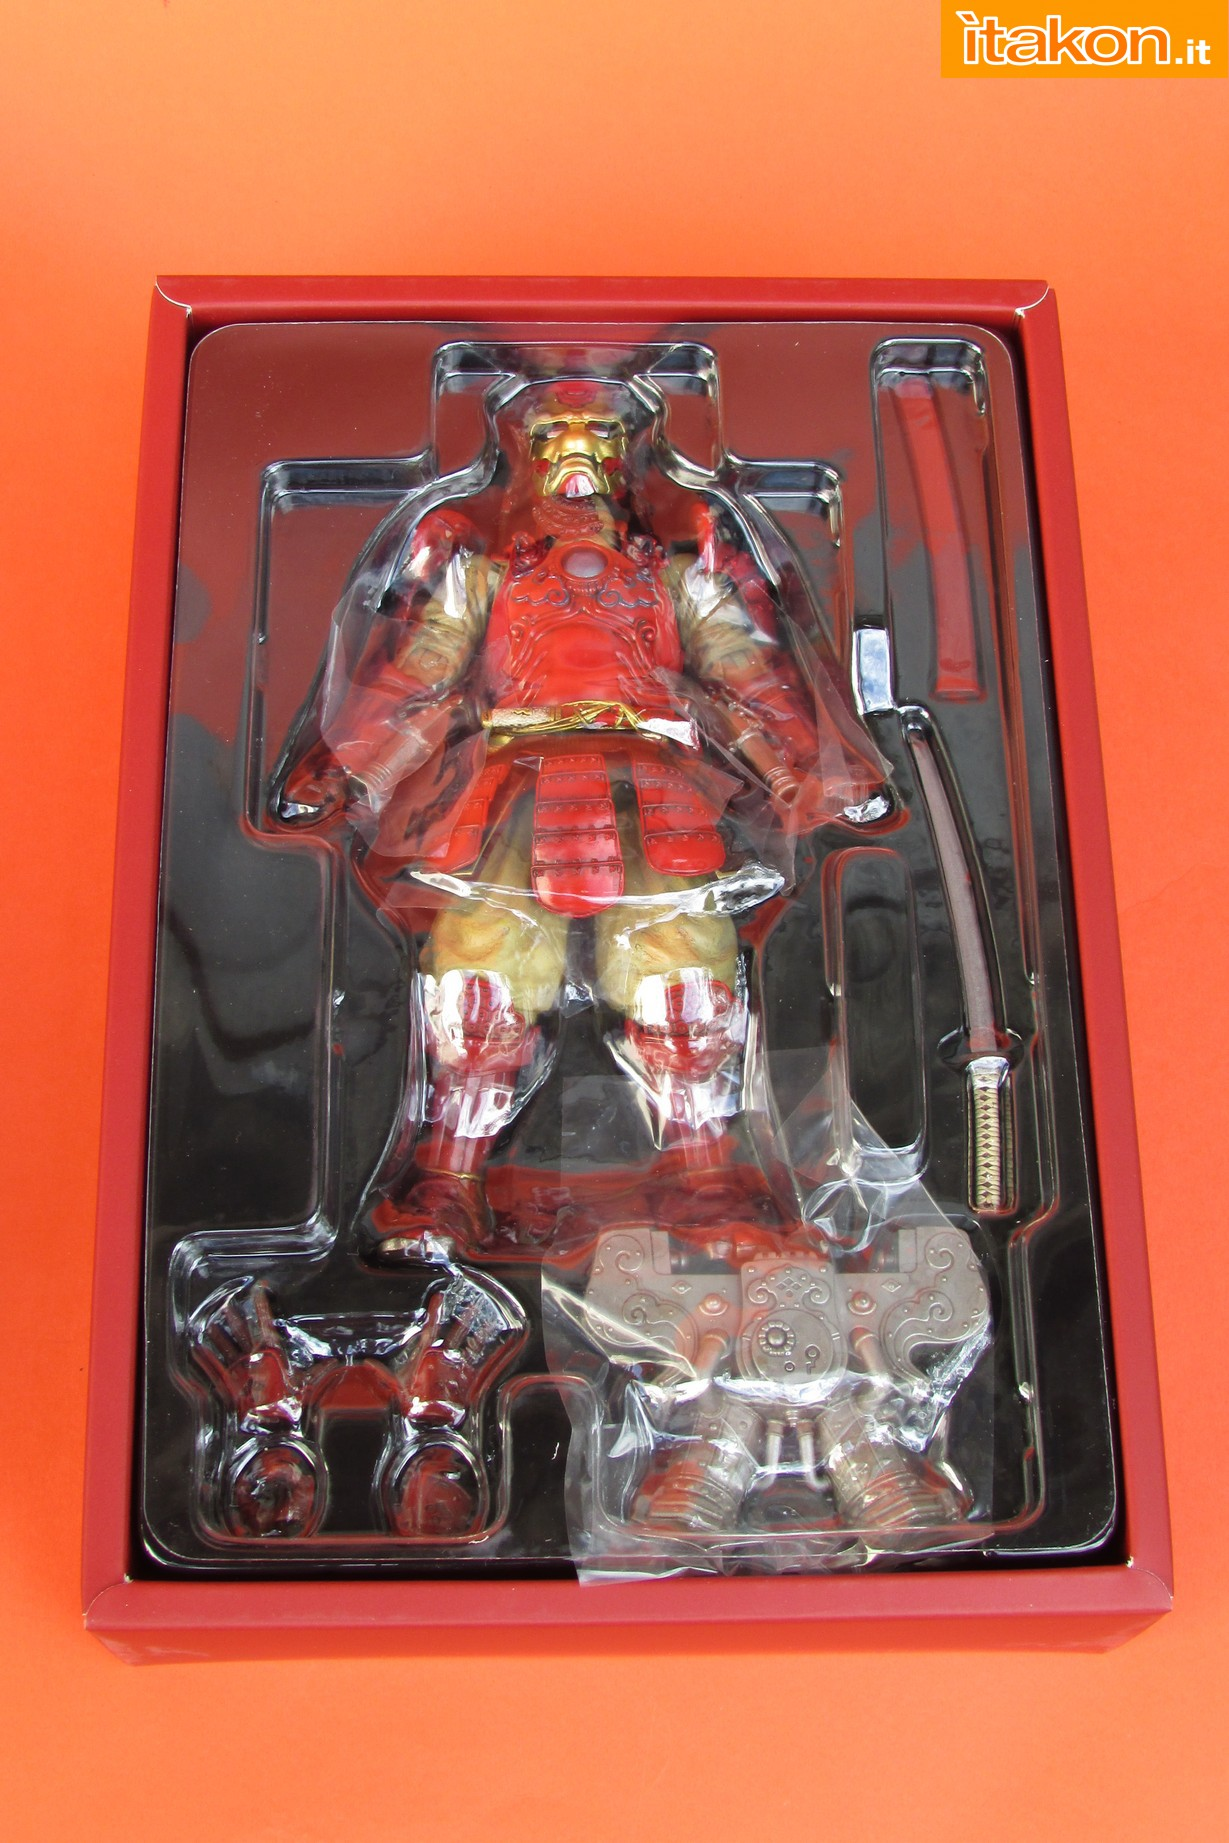 Link a Marvel Comics Koutetsu Samurai Iron Man Mark 3 Meishou MANGA REALIZATION review Bandai Itakon.it08